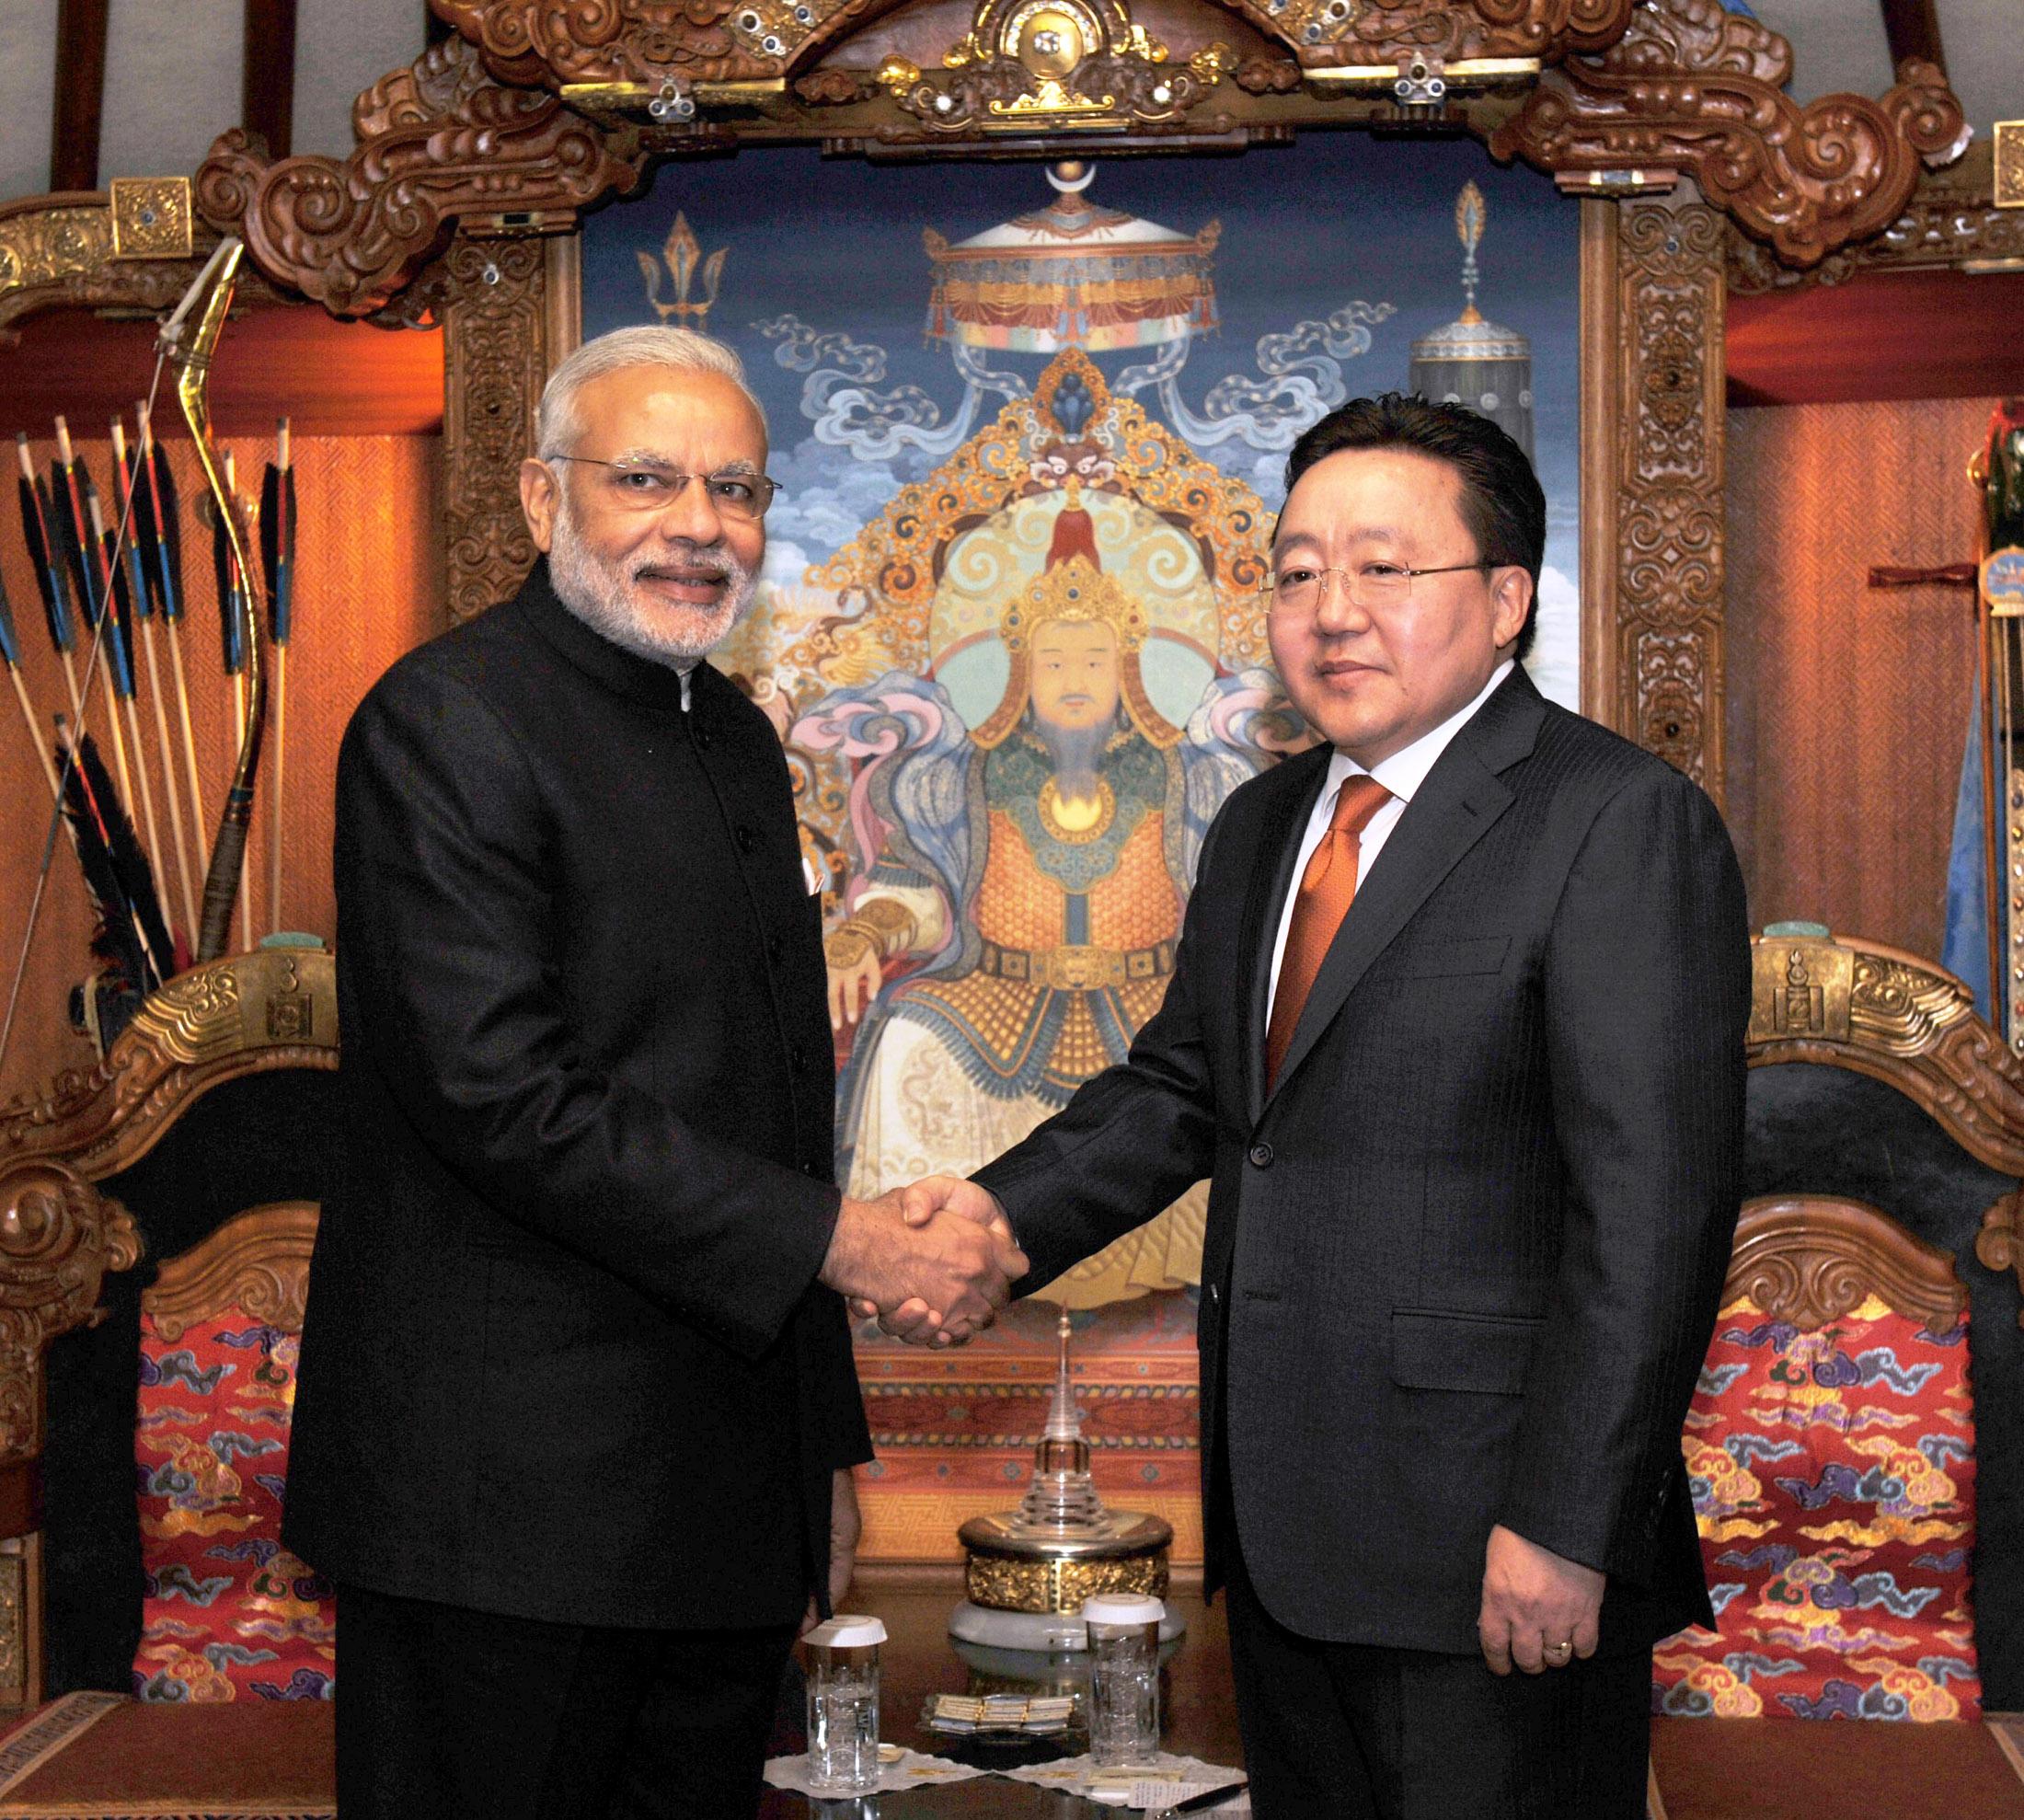 Prime Minister, Narendra Modi meeting the President of Mongolia, Tsakhiagiin Elbegdorj, in Mongolia on Sunday.